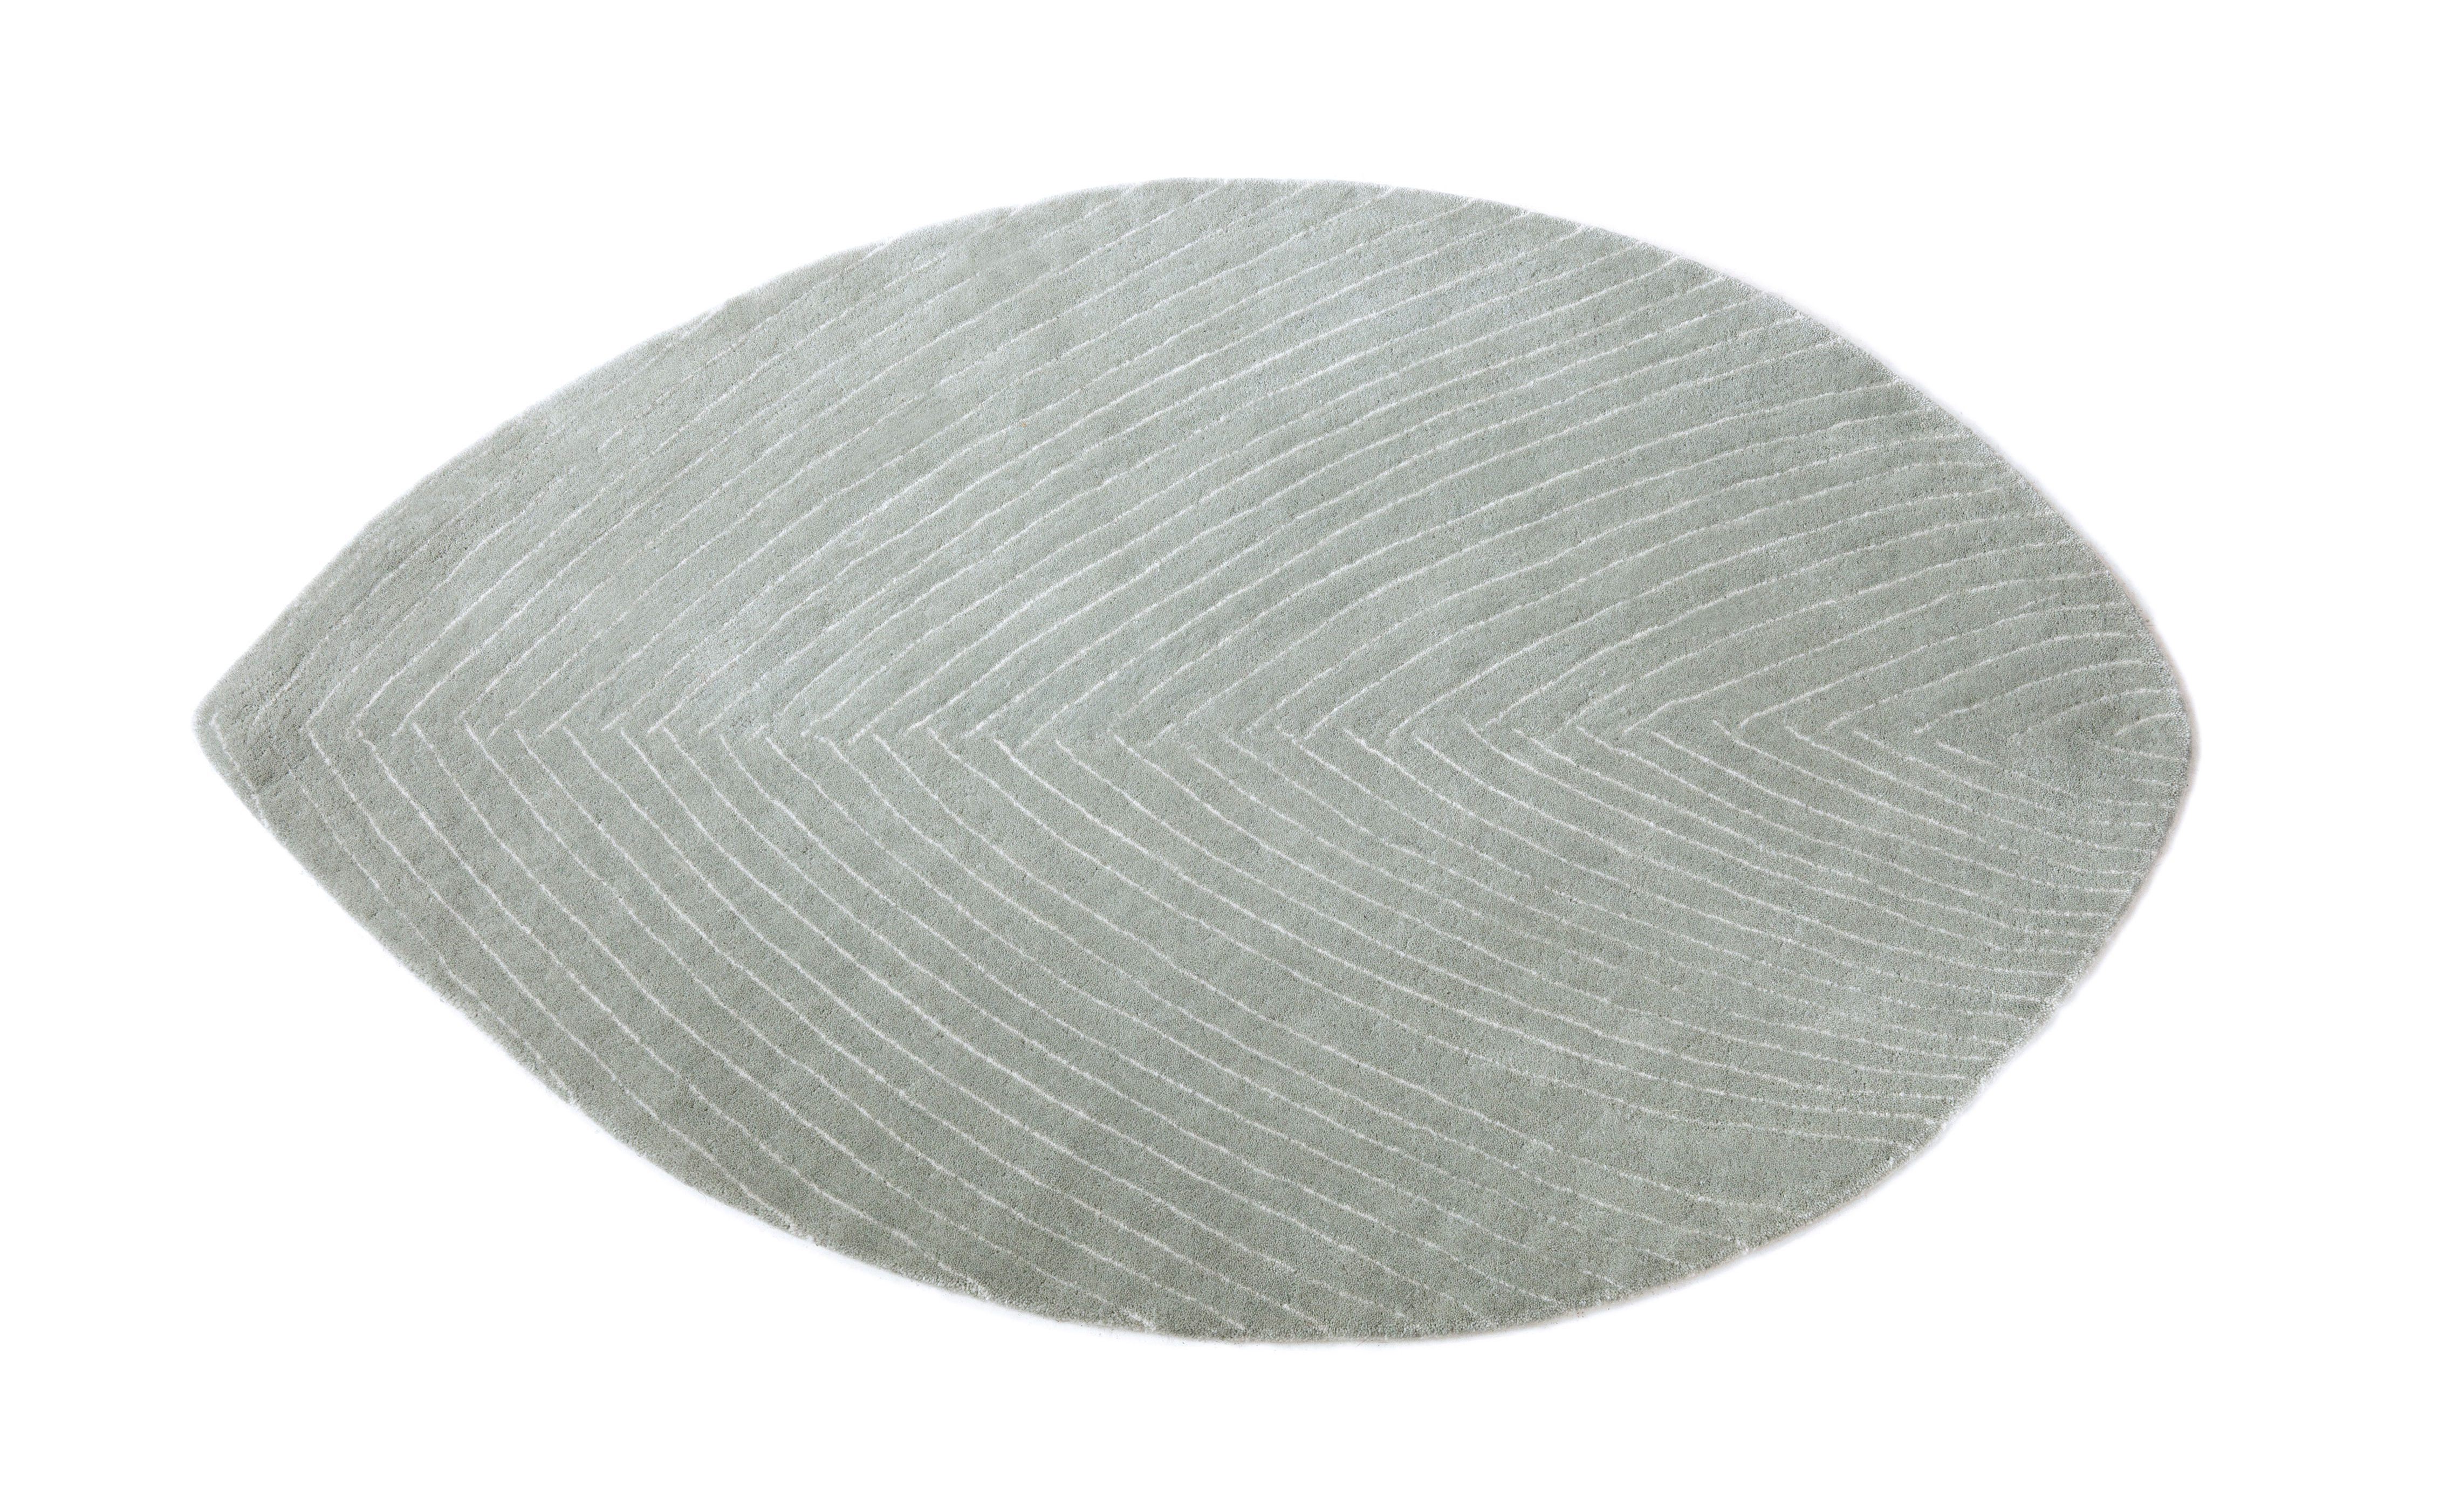 Déco - Tapis - Tapis Quill Small / 78 x 120 cm - Nanimarquina - Gris pluvieux - Laine vierge